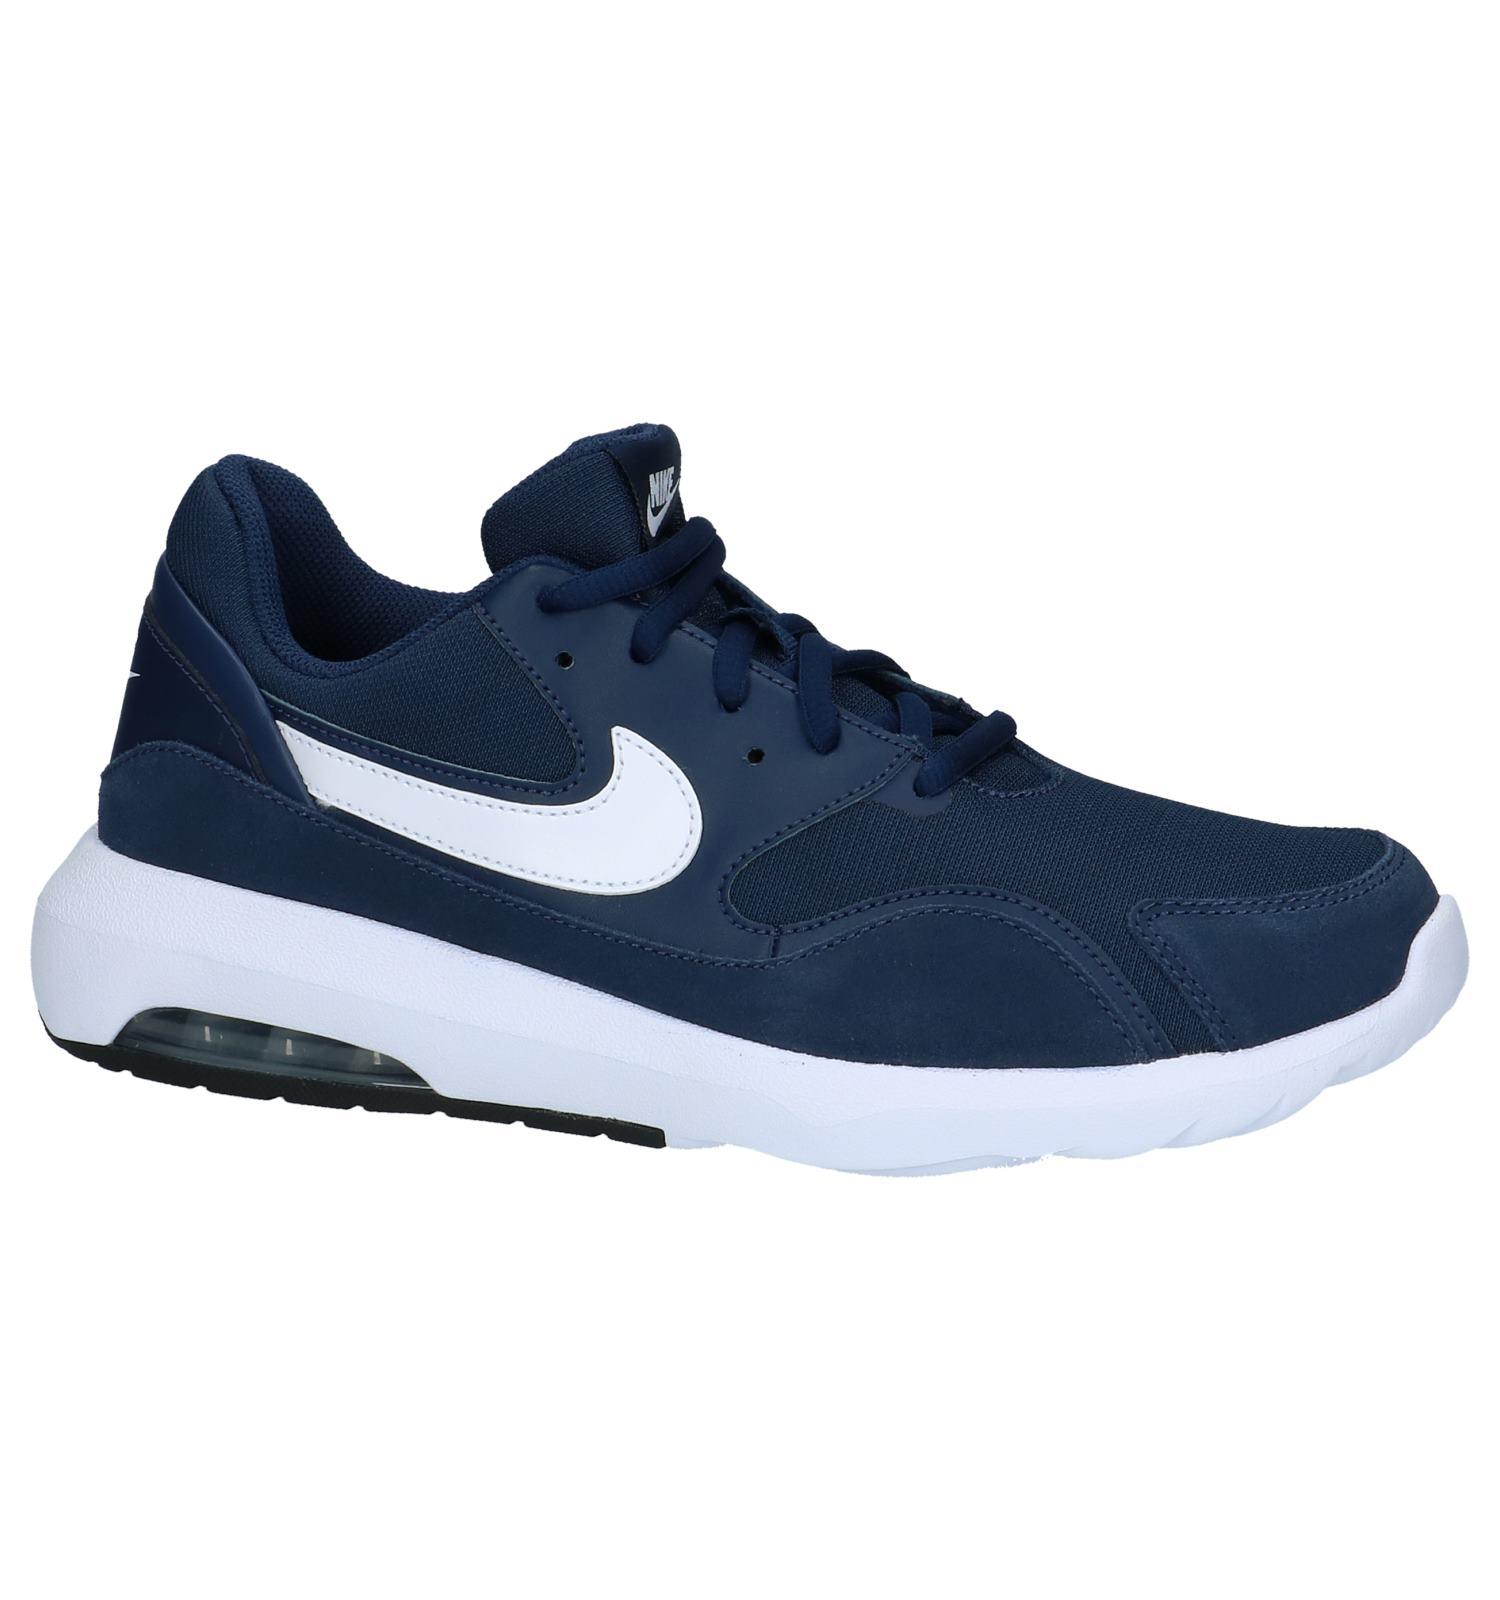 outlet store 19db3 2061b Donker Blauwe Nike Air Max Nostalgic Sneakers  TORFS.BE  Gratis verzend  en retour